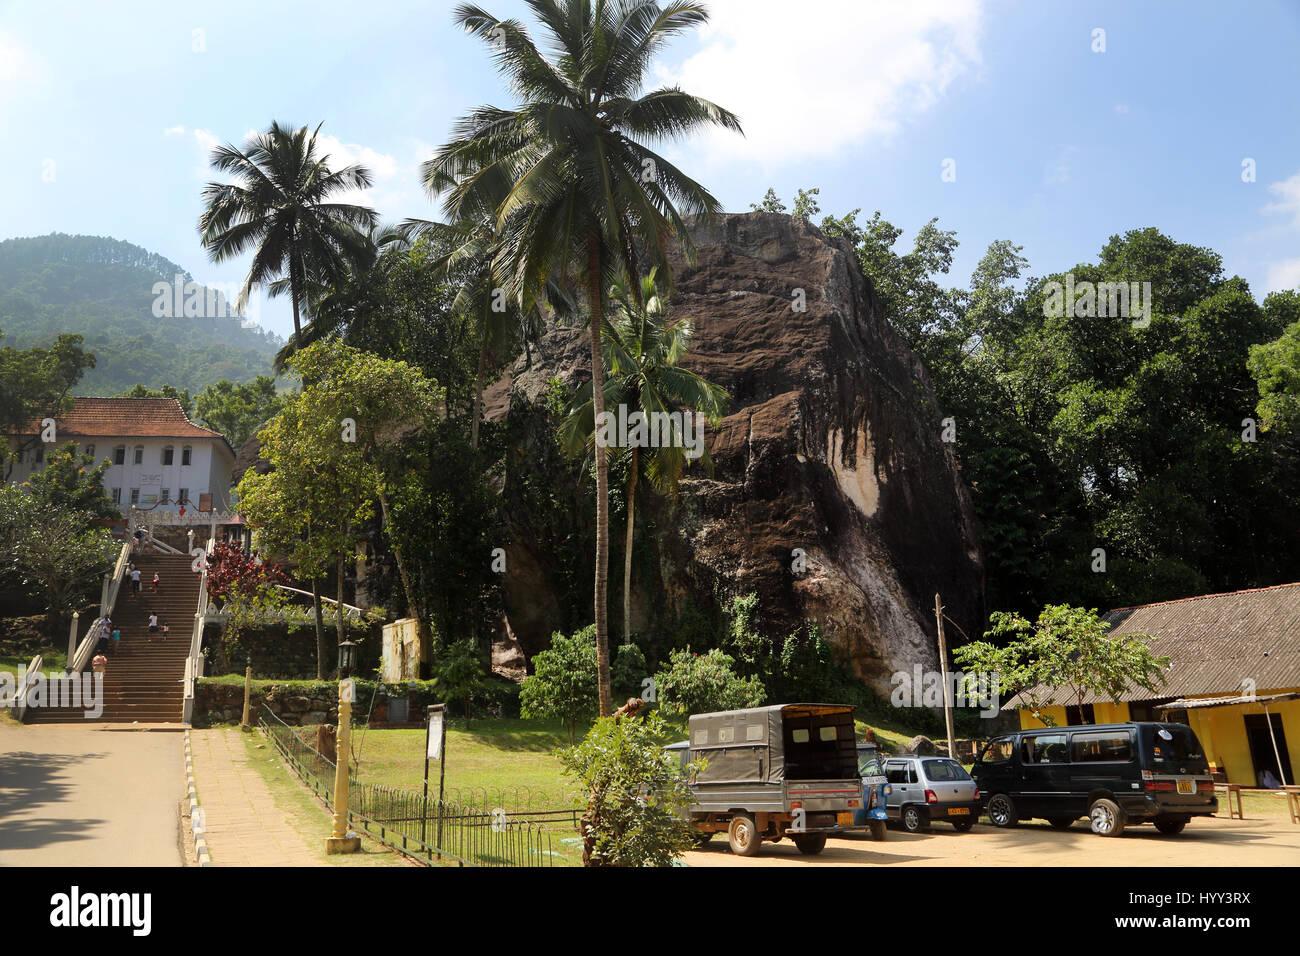 Aluviharaya Rock Cave Temple Sri Lanka Matale District Kandy